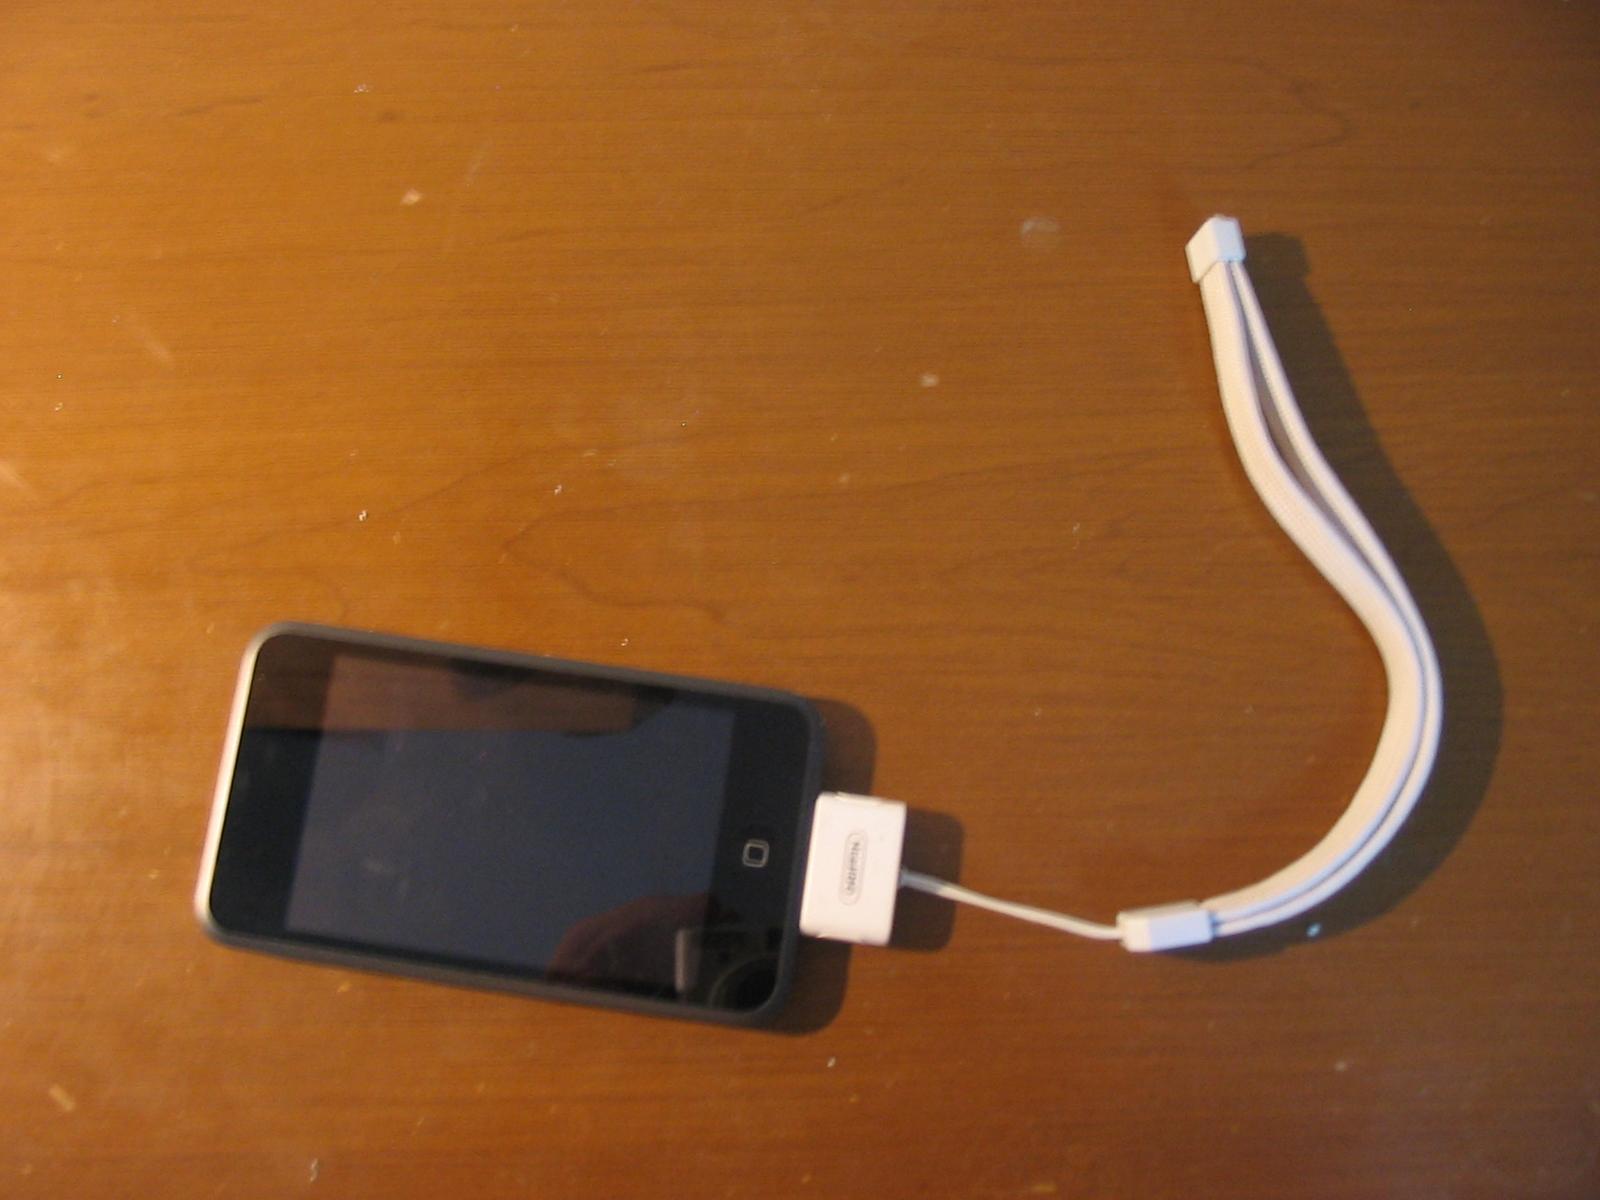 iPhone Locking Wrist Strap